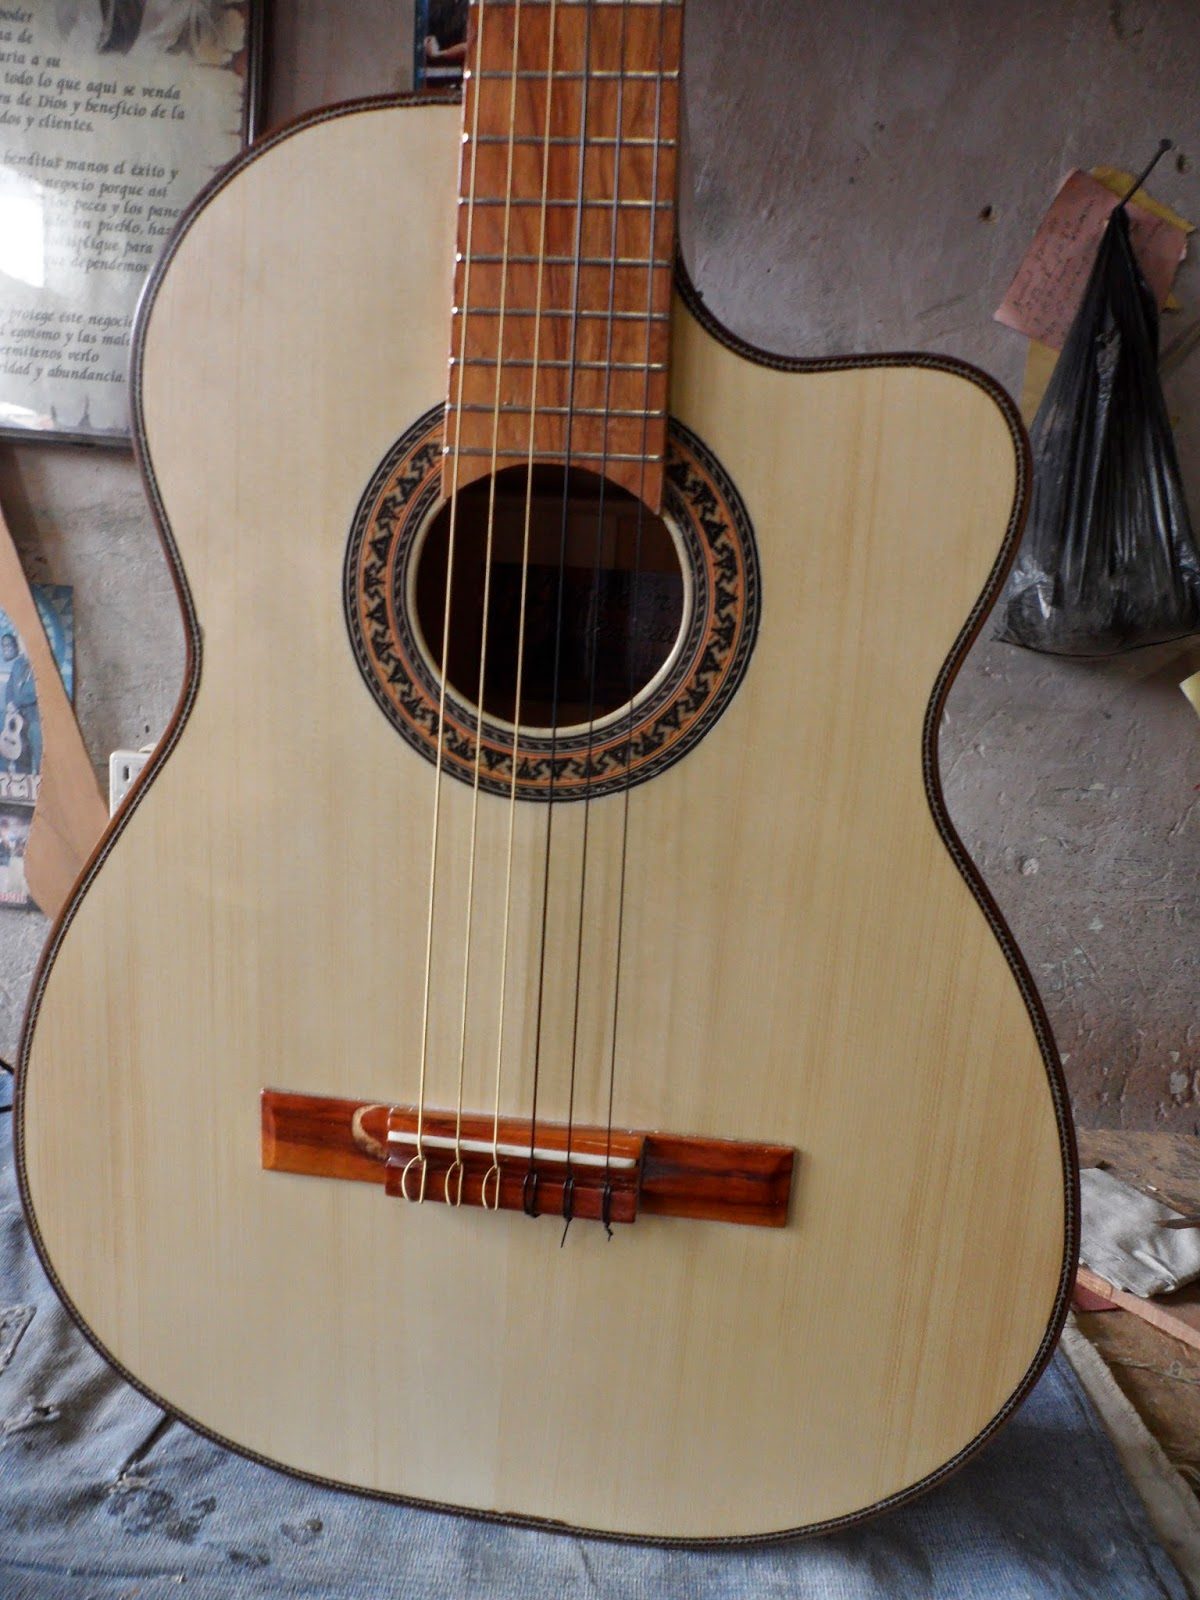 Wilson castillo luthier guitarra clasica for Guitarras de luthier